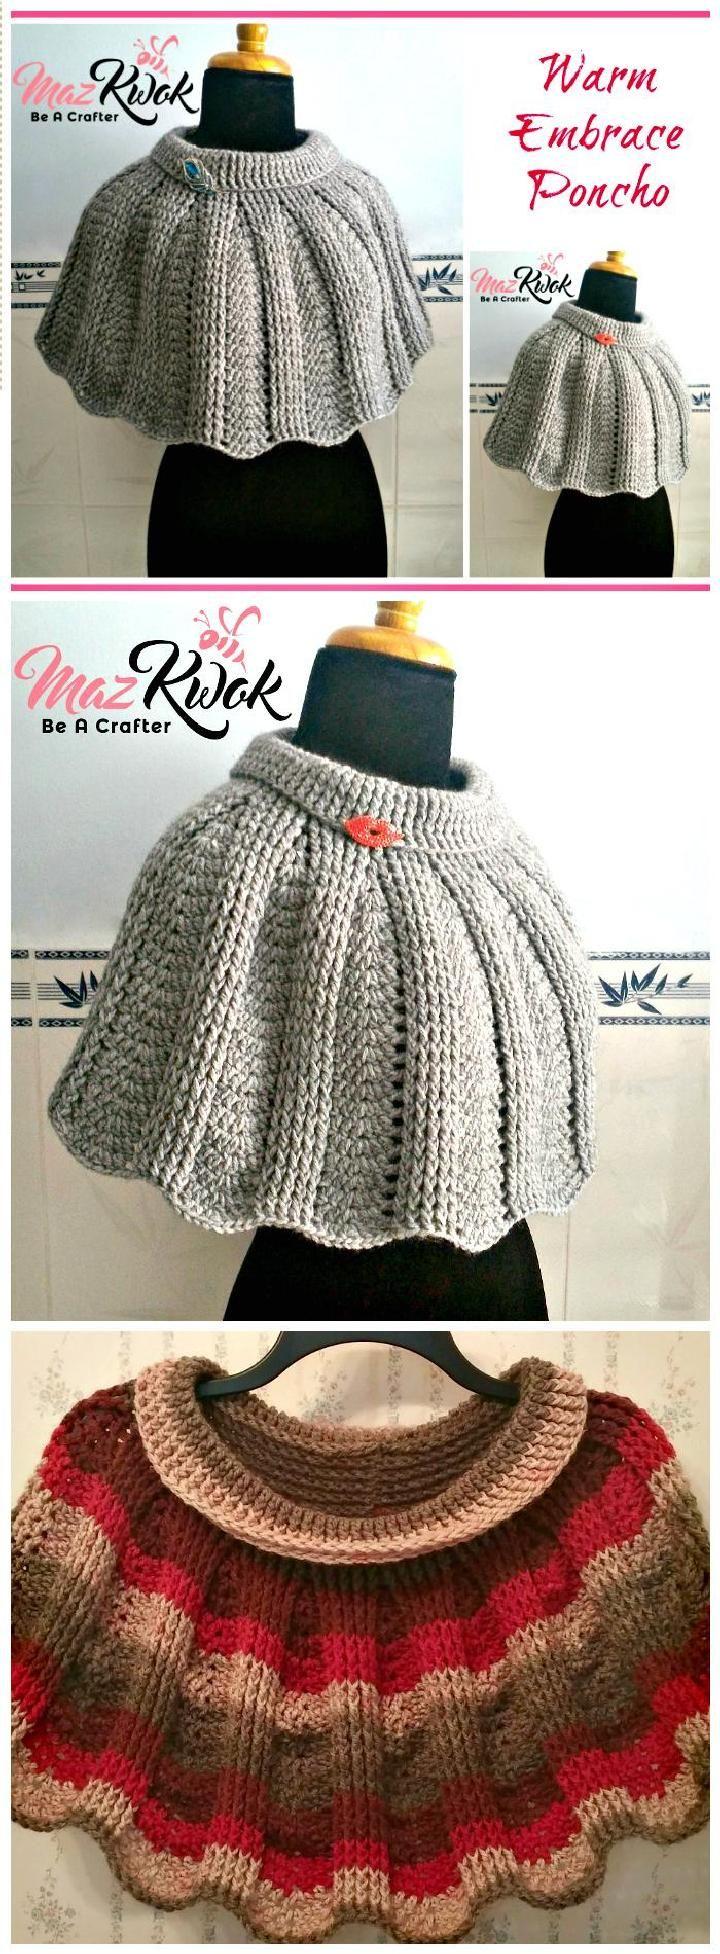 24340 best crochet images on pinterest crocheting filet crochet 20 free crochet summer poncho patterns for womens bankloansurffo Images